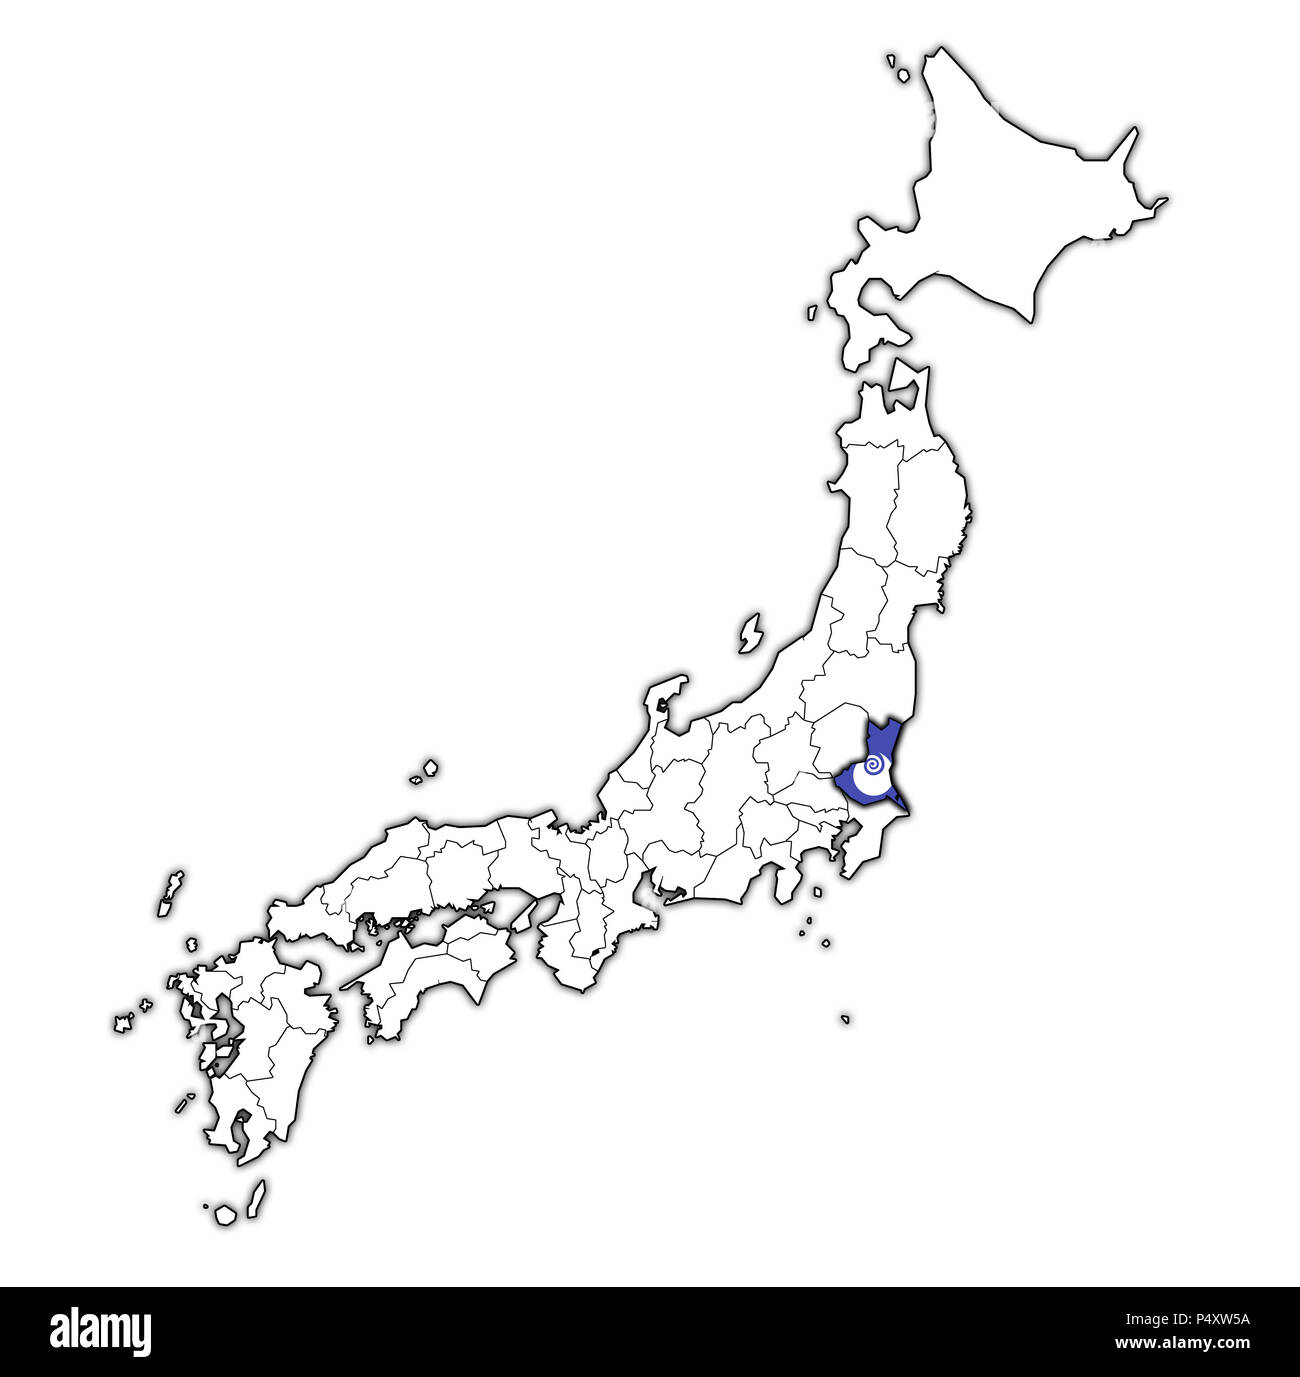 Ibaraki Japan Map.Ibaraki Map Stock Photos Ibaraki Map Stock Images Alamy